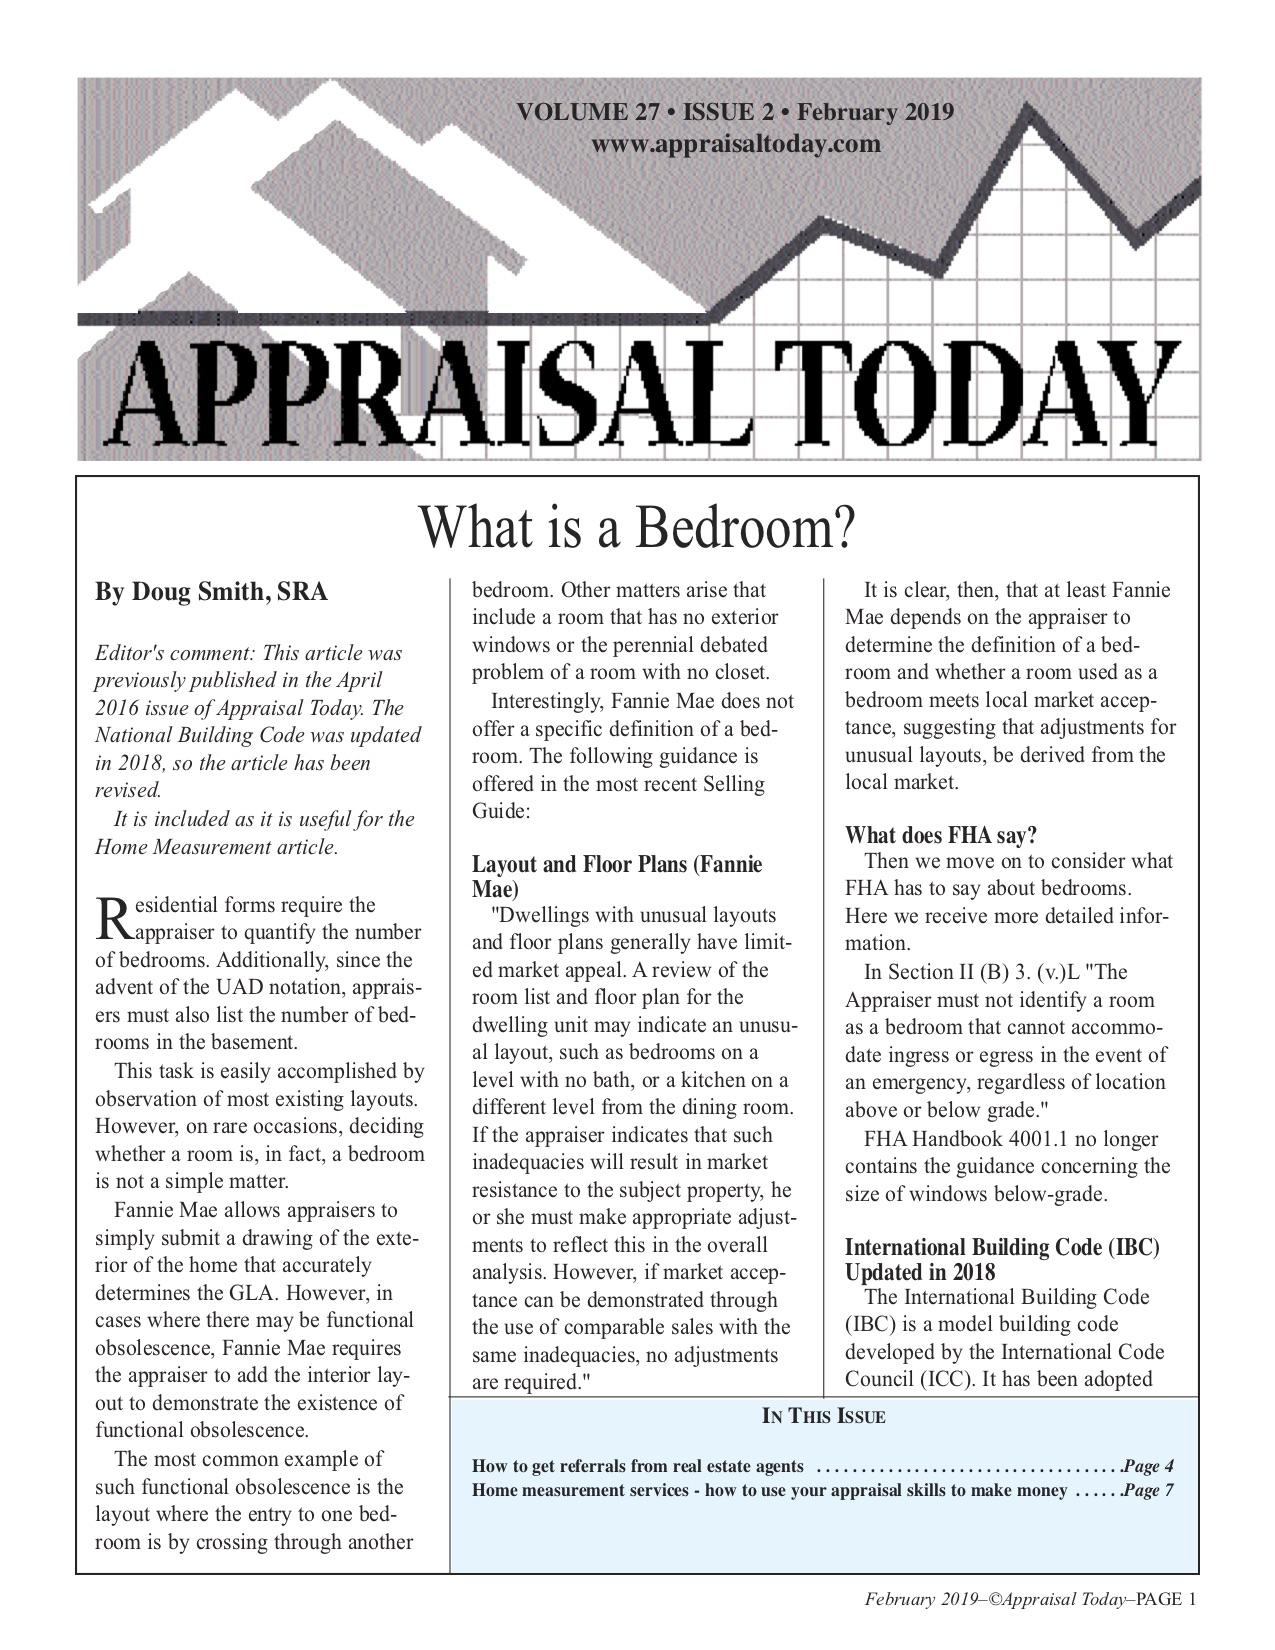 AppraisalToday02-19 (2).jpg